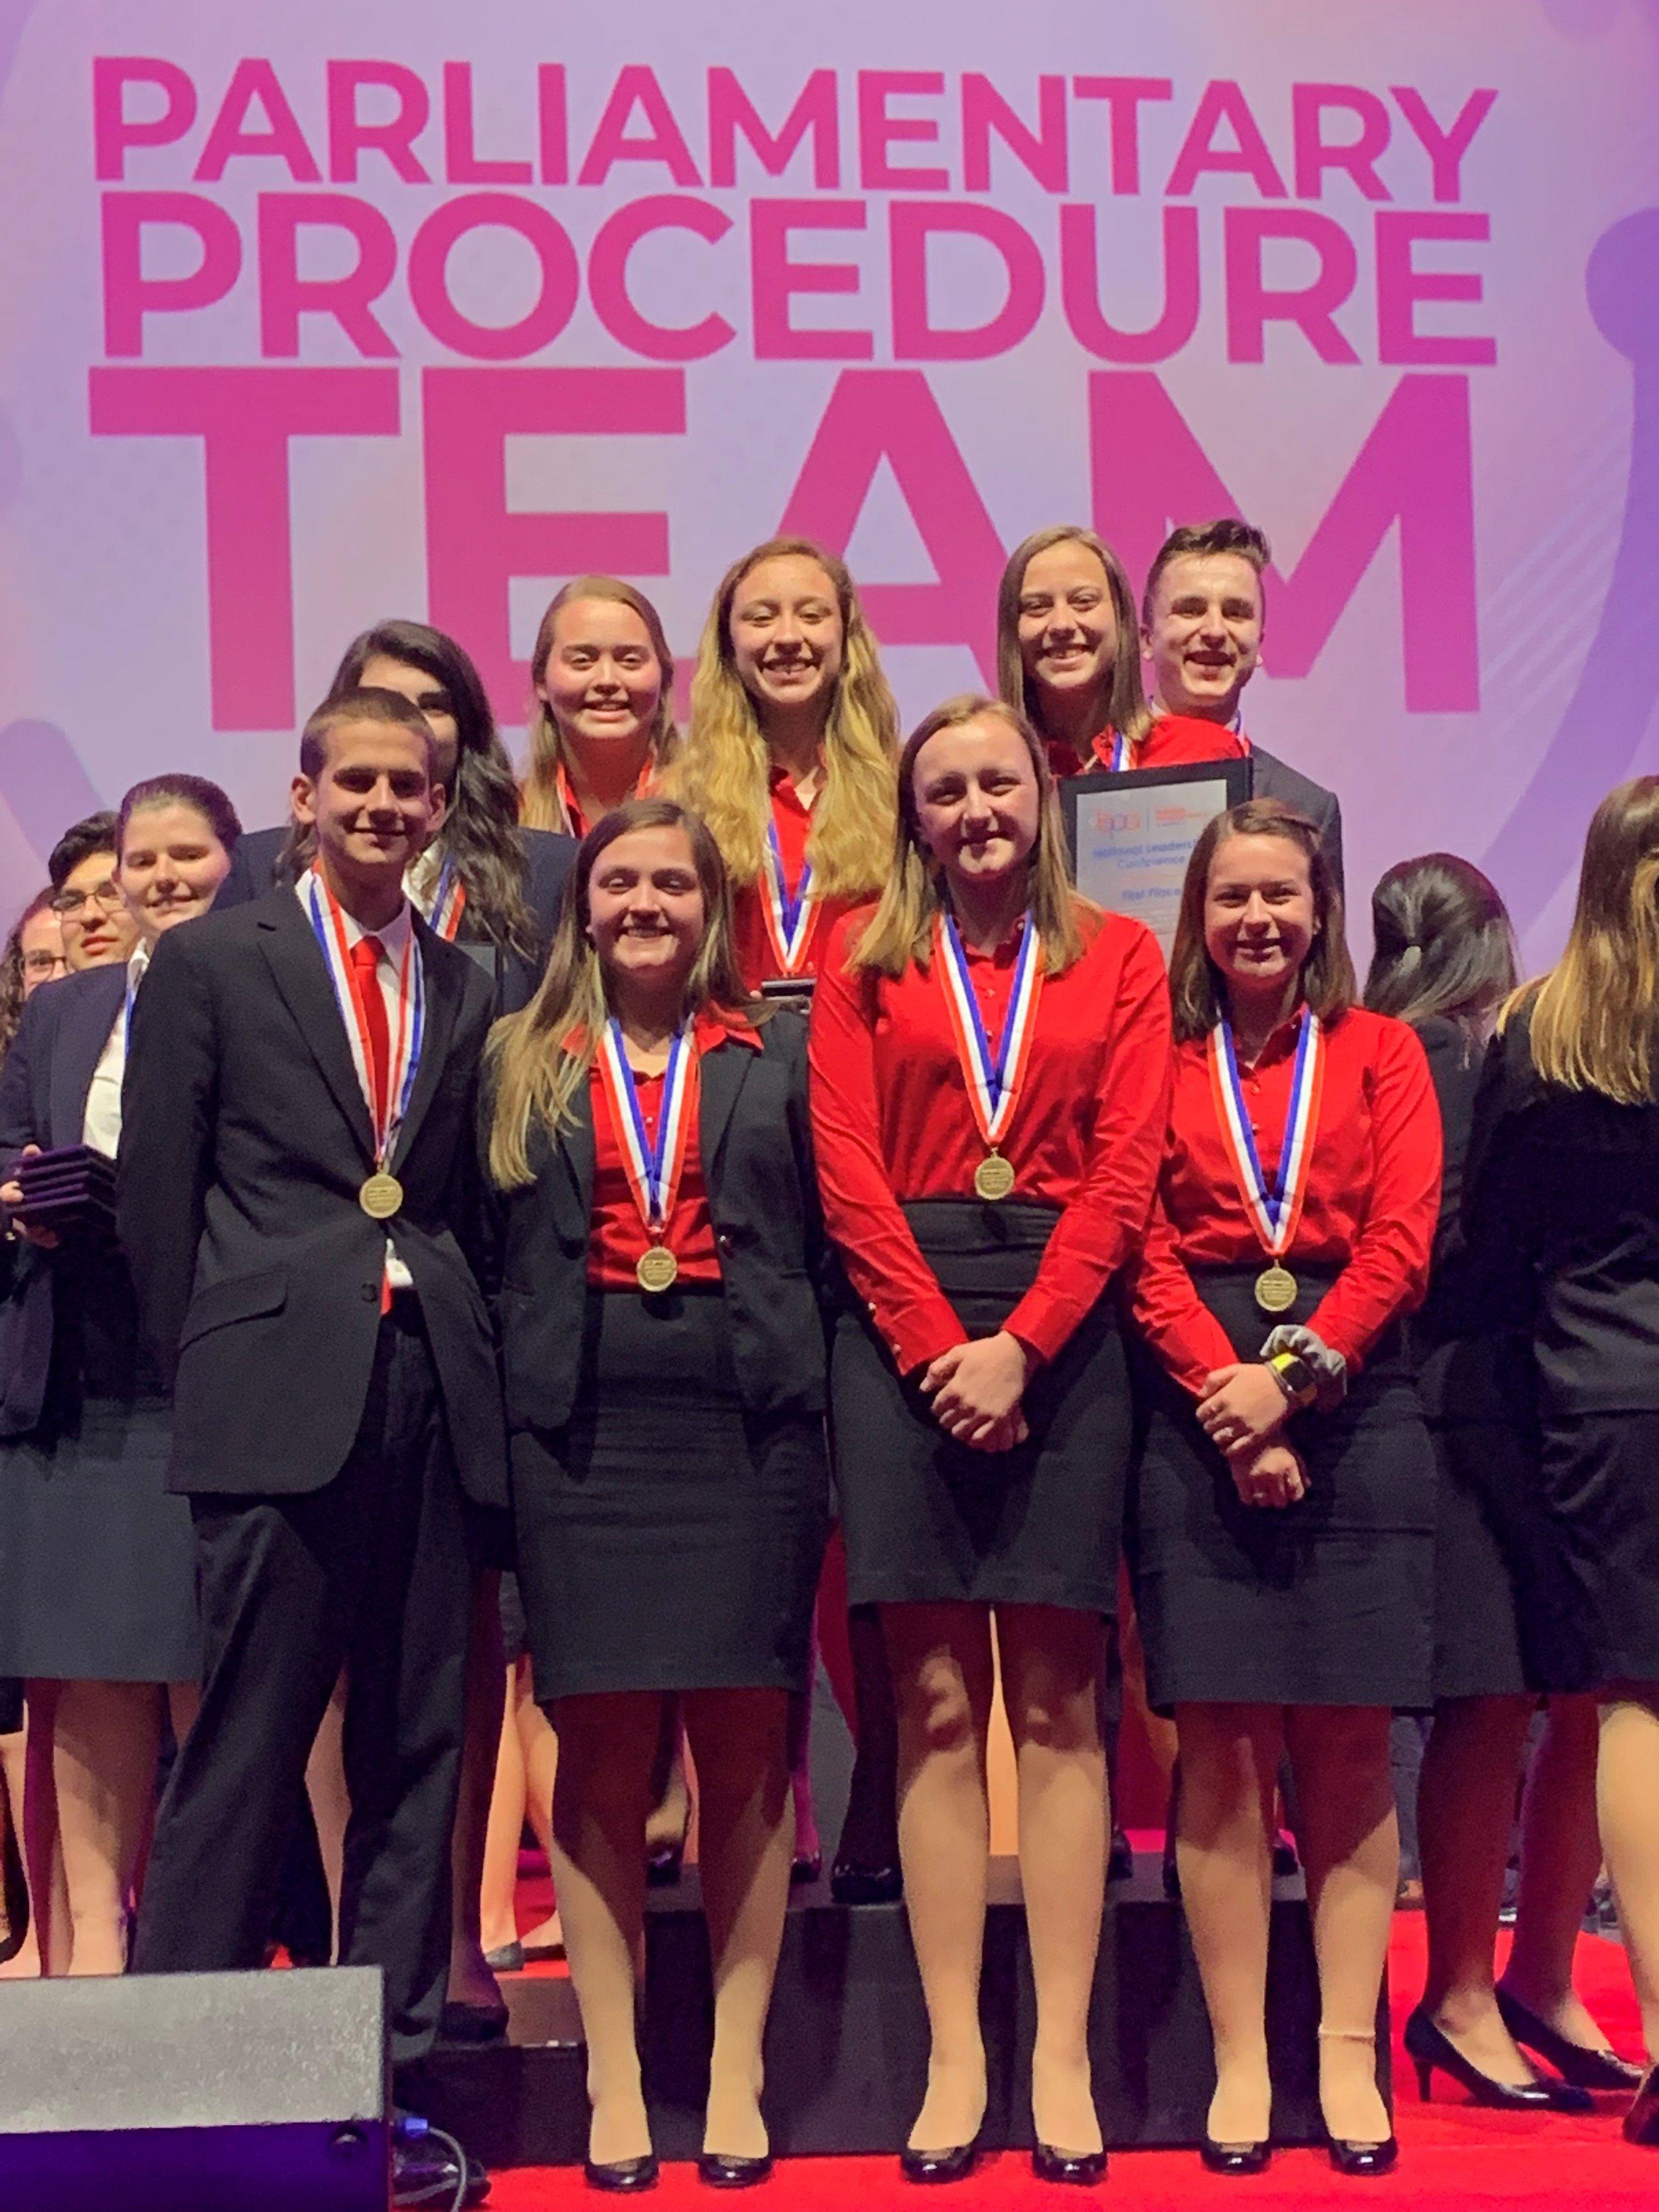 Stephenson HS - 1st place Parliamentary Procedure Team (2019 NLC)